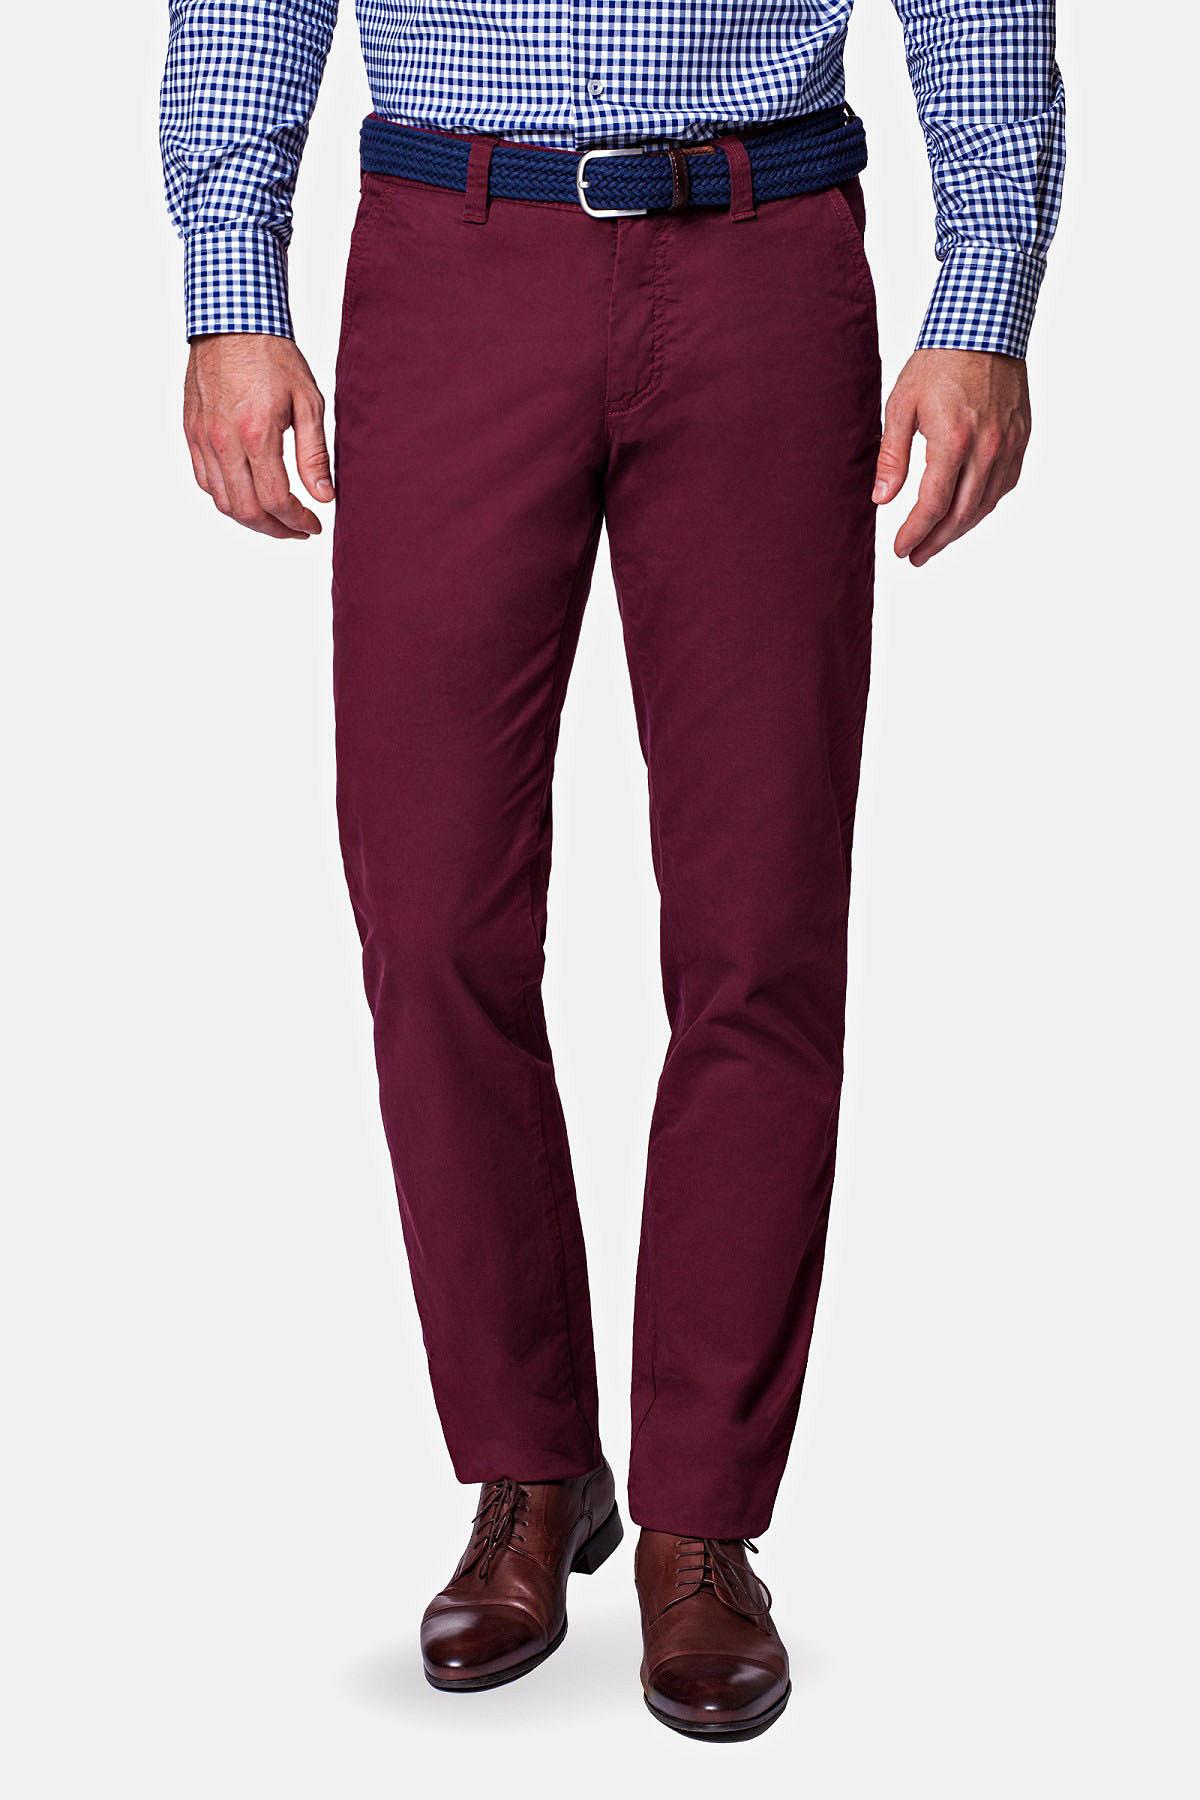 Spodnie Bordeaux Chino Kevin II rozmiar 182/82; 182/84